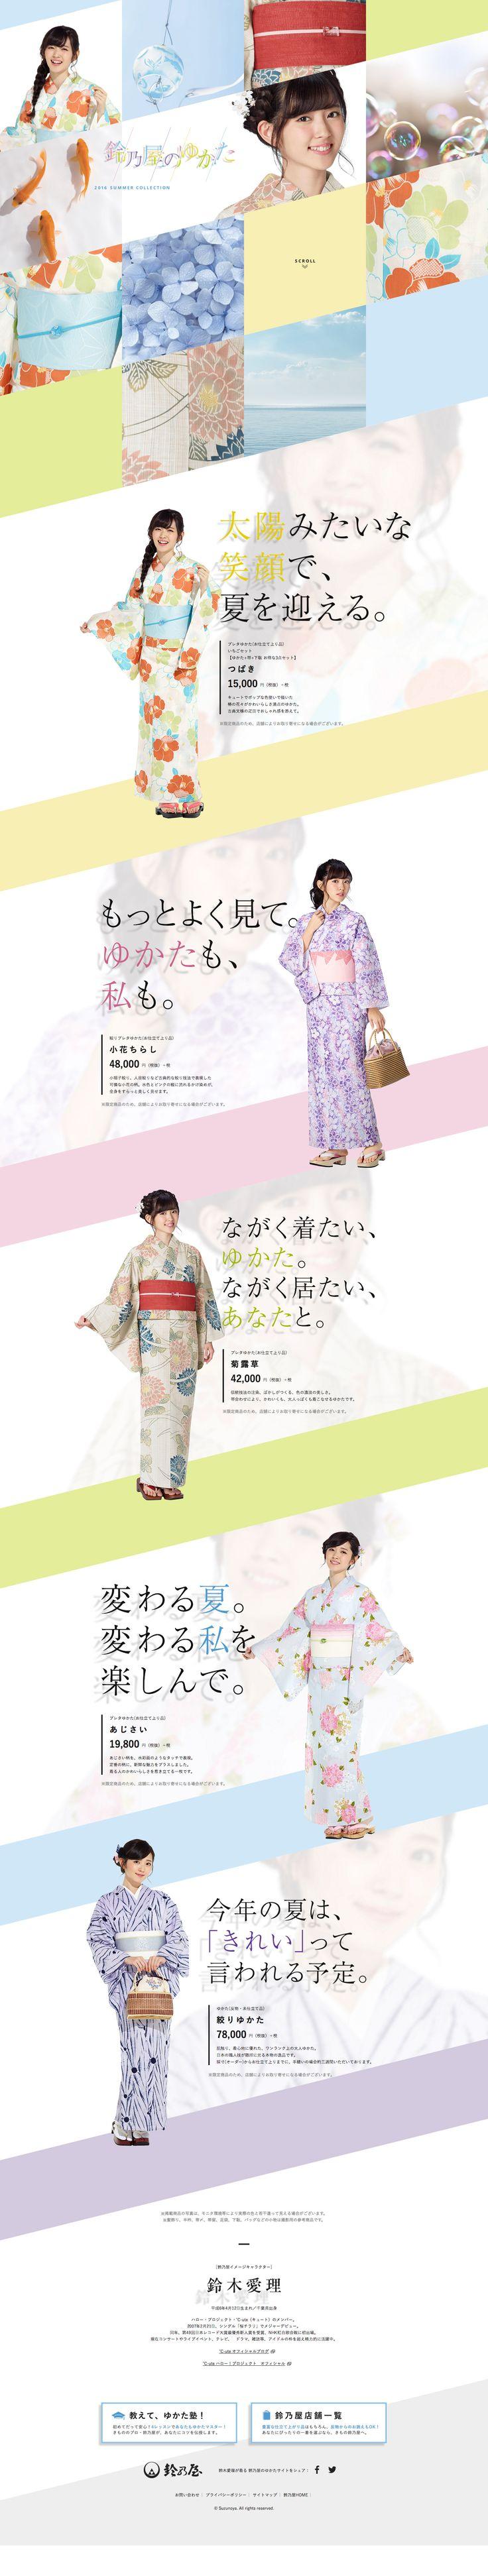 http://www.suzunoya.com/yukata/